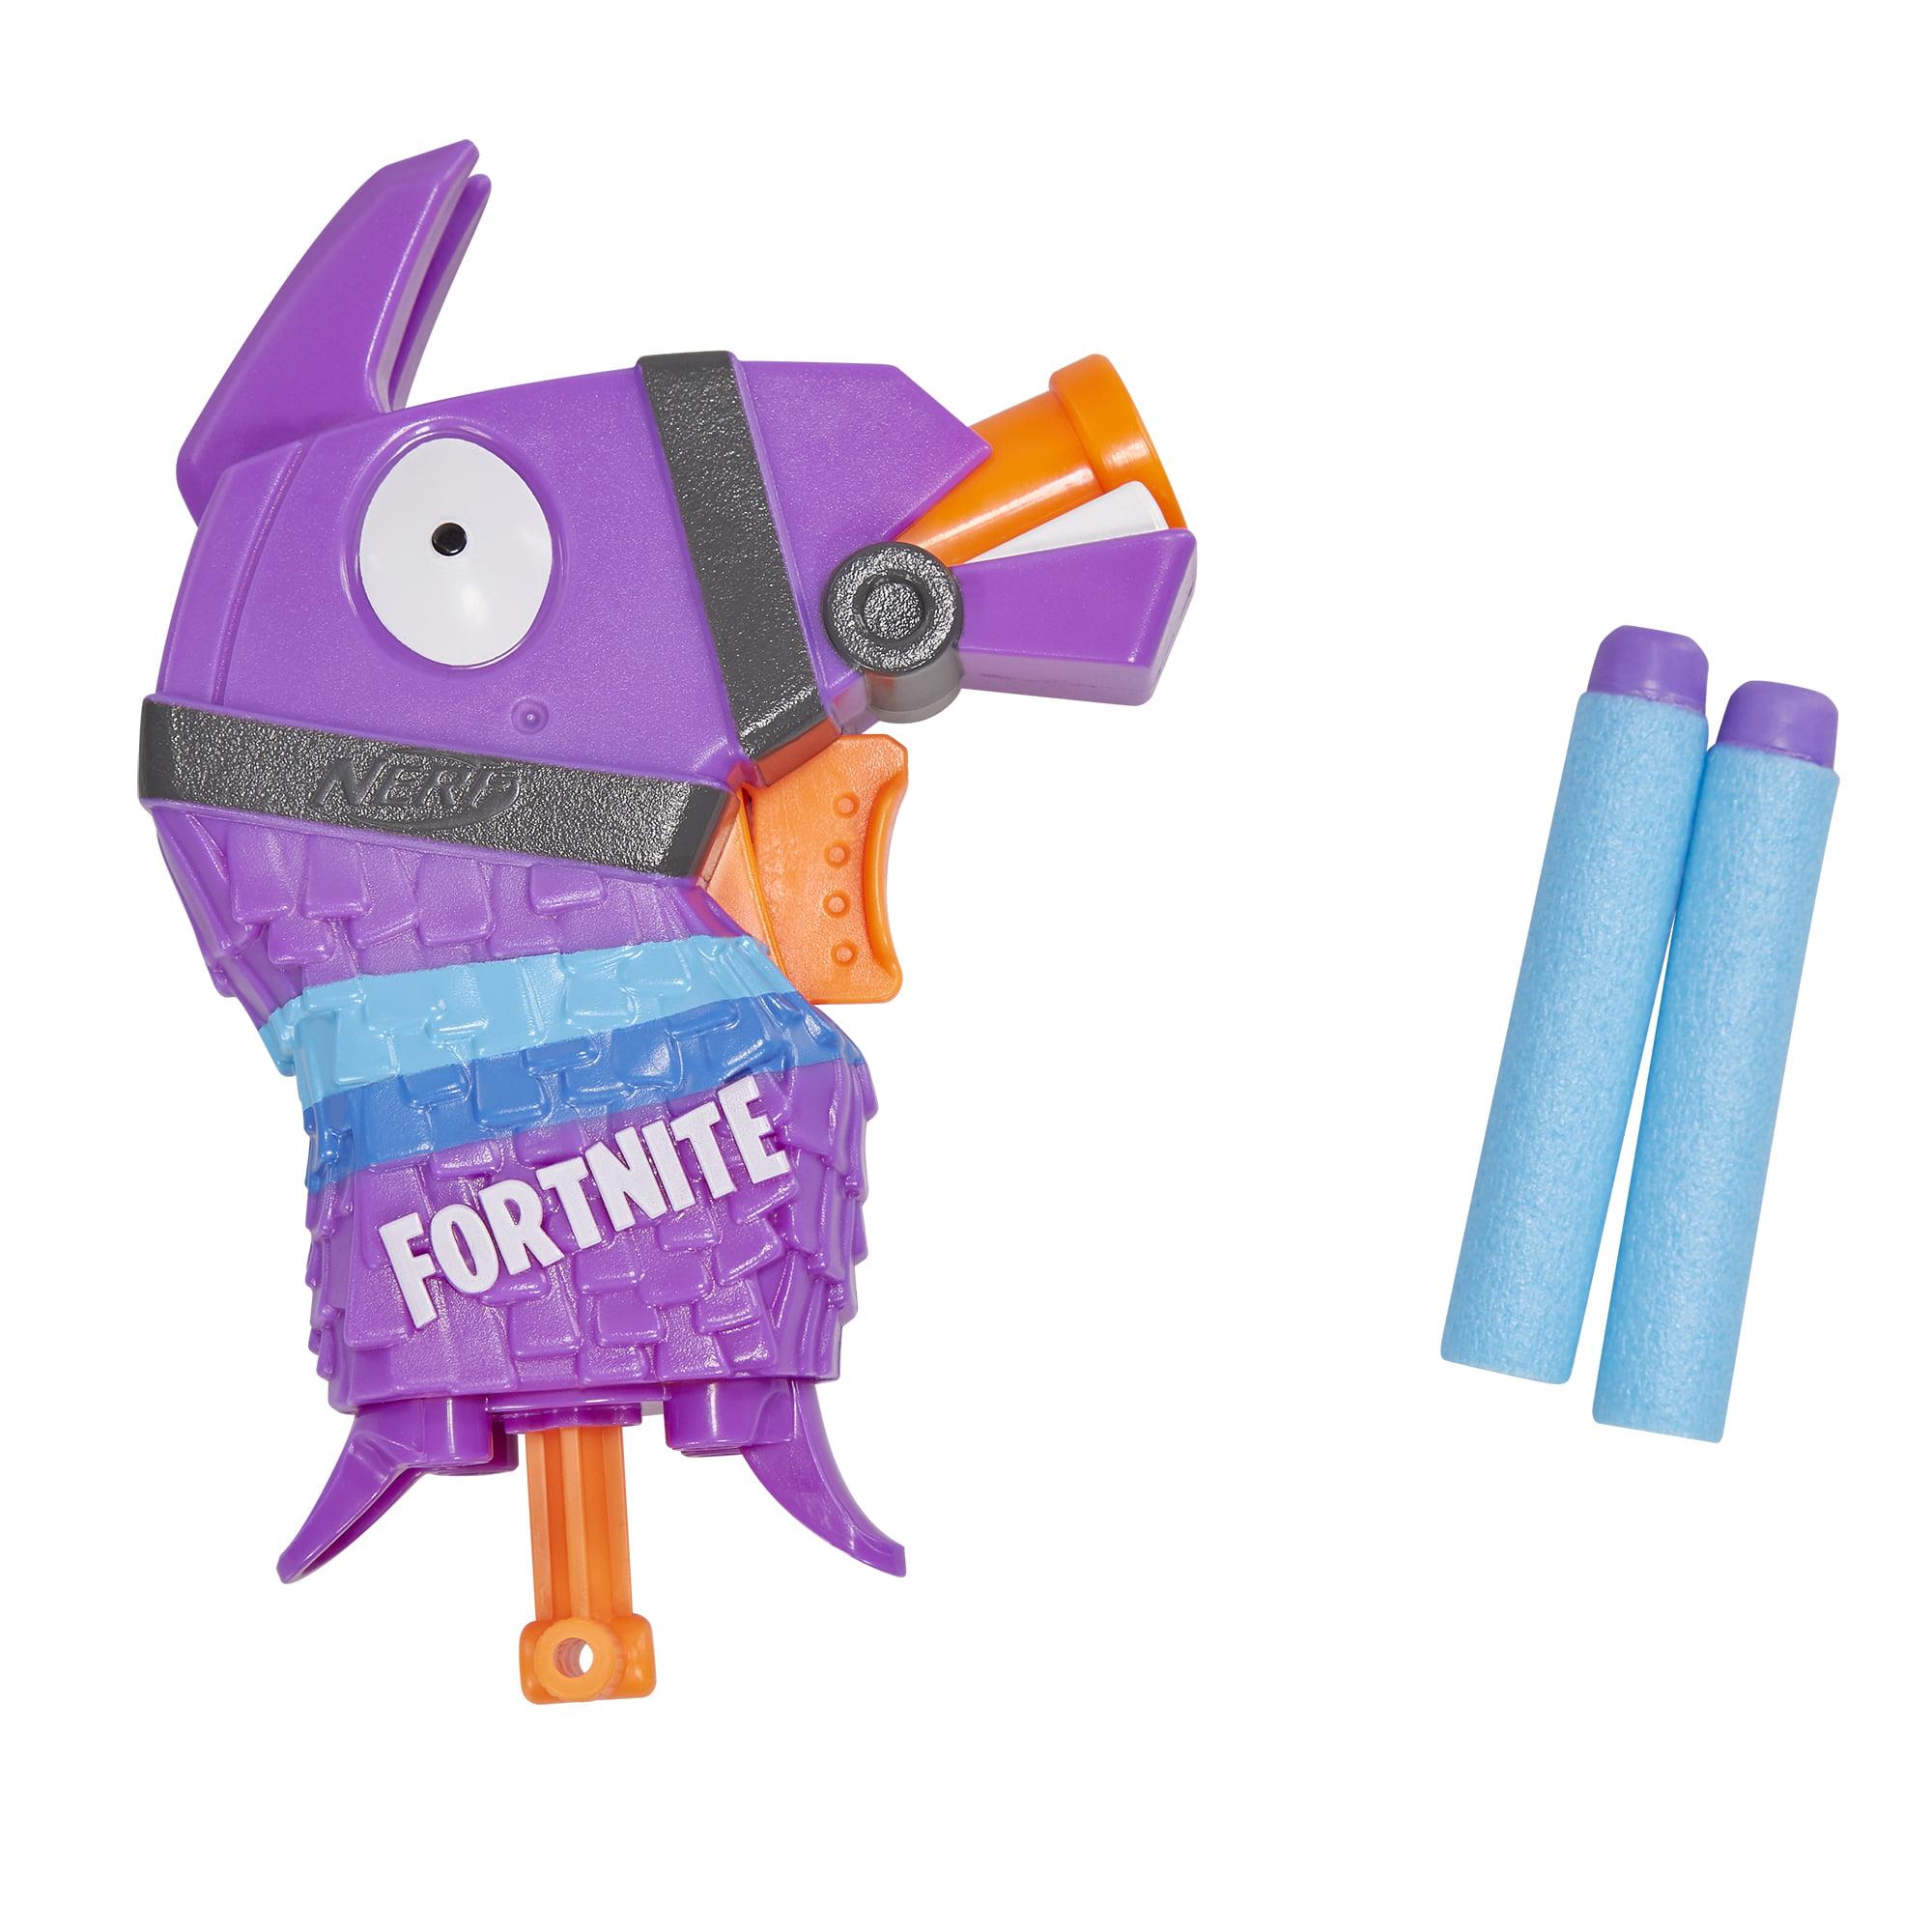 Nerf Fortnite Llama Nerf MicroShots Dart-Firing Toy Blaster and 2 Official Nerf Elite Darts